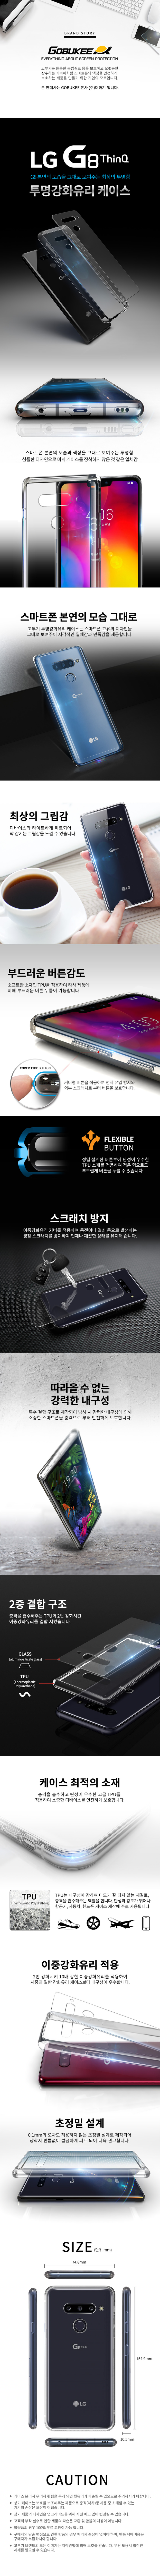 G8본연의 모습을 그대로 보여주는 최상의투명함 투명강화유리케이스 스마트폰 본연의 모습과 색상을 그대로 보여주는 투명함 심플한 디자인으로 마치 케이스를 장착하지 않은 것 같은 일체감 스마트폰 본연의 모습 그대로 최상의 그립감 부드러운 버튼감도 스크래치 방지 따라올수없는 강력한 내구성 2중결합구조 케이스 최적의 소재 이중강화유리적용 초정밀 설계